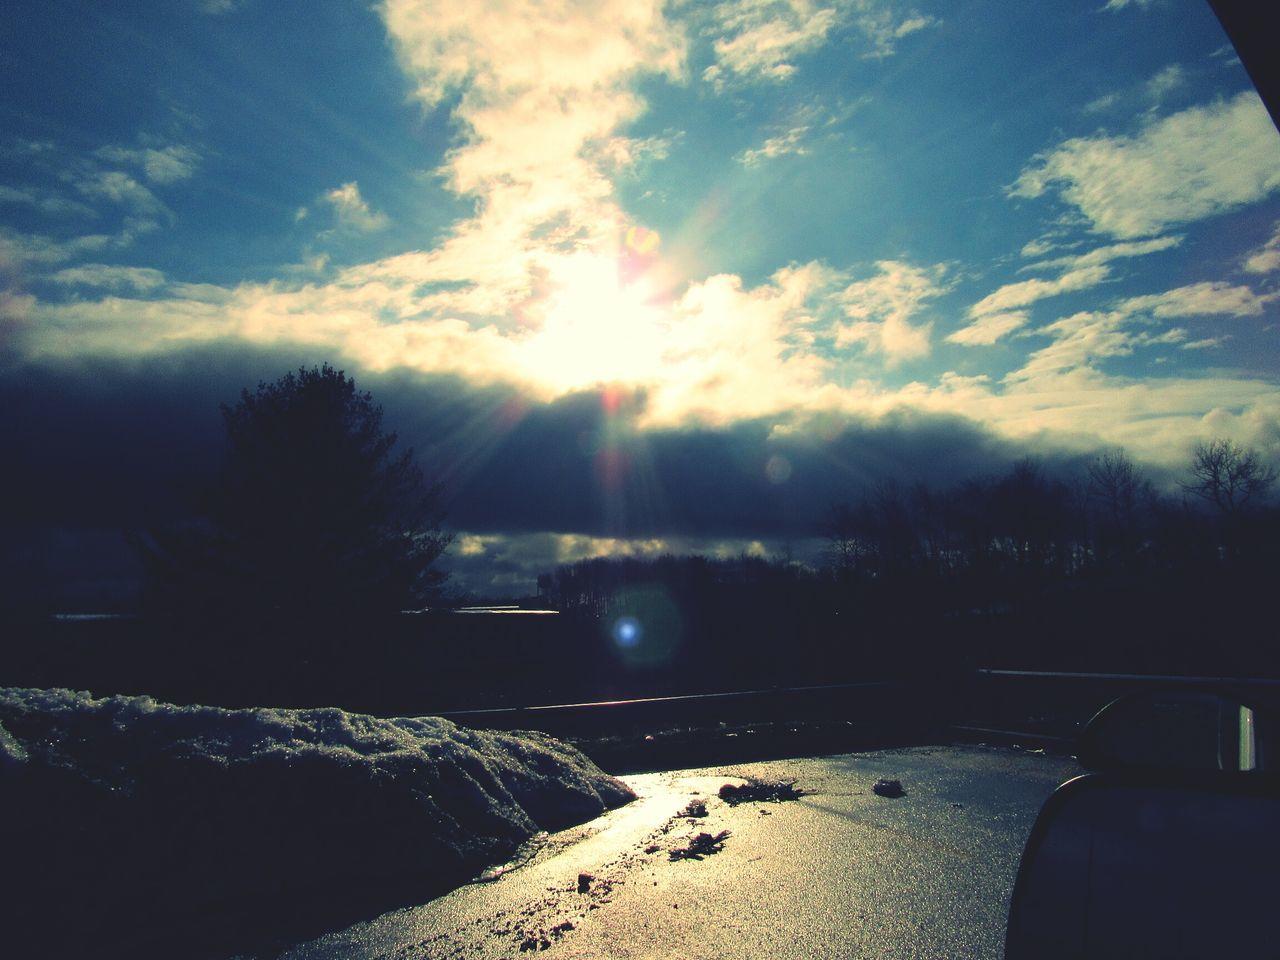 Clouds And Sky Sunflaresaturday Sunflares Blueandblacksky EyeEm Nature Lover The Great Outdoors - 2015 EyeEm Awards